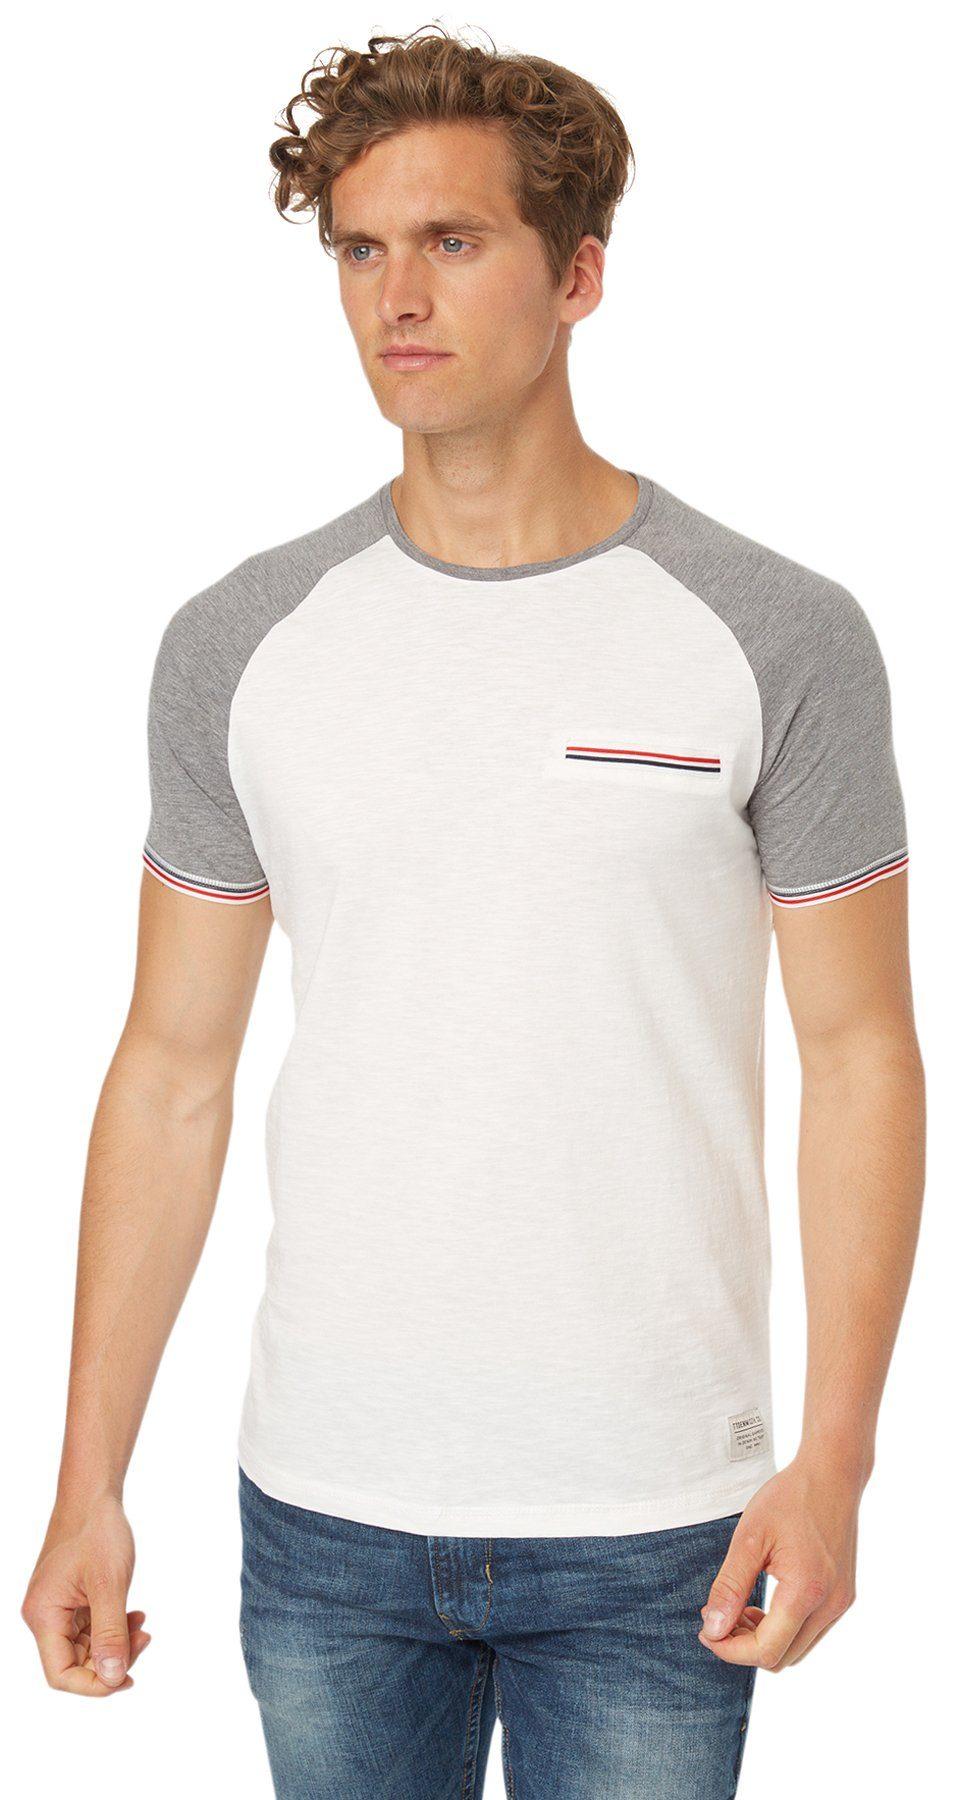 TOM TAILOR DENIM T-Shirt »Kurzarm T-Shirt mit Raglan-Ärmeln«